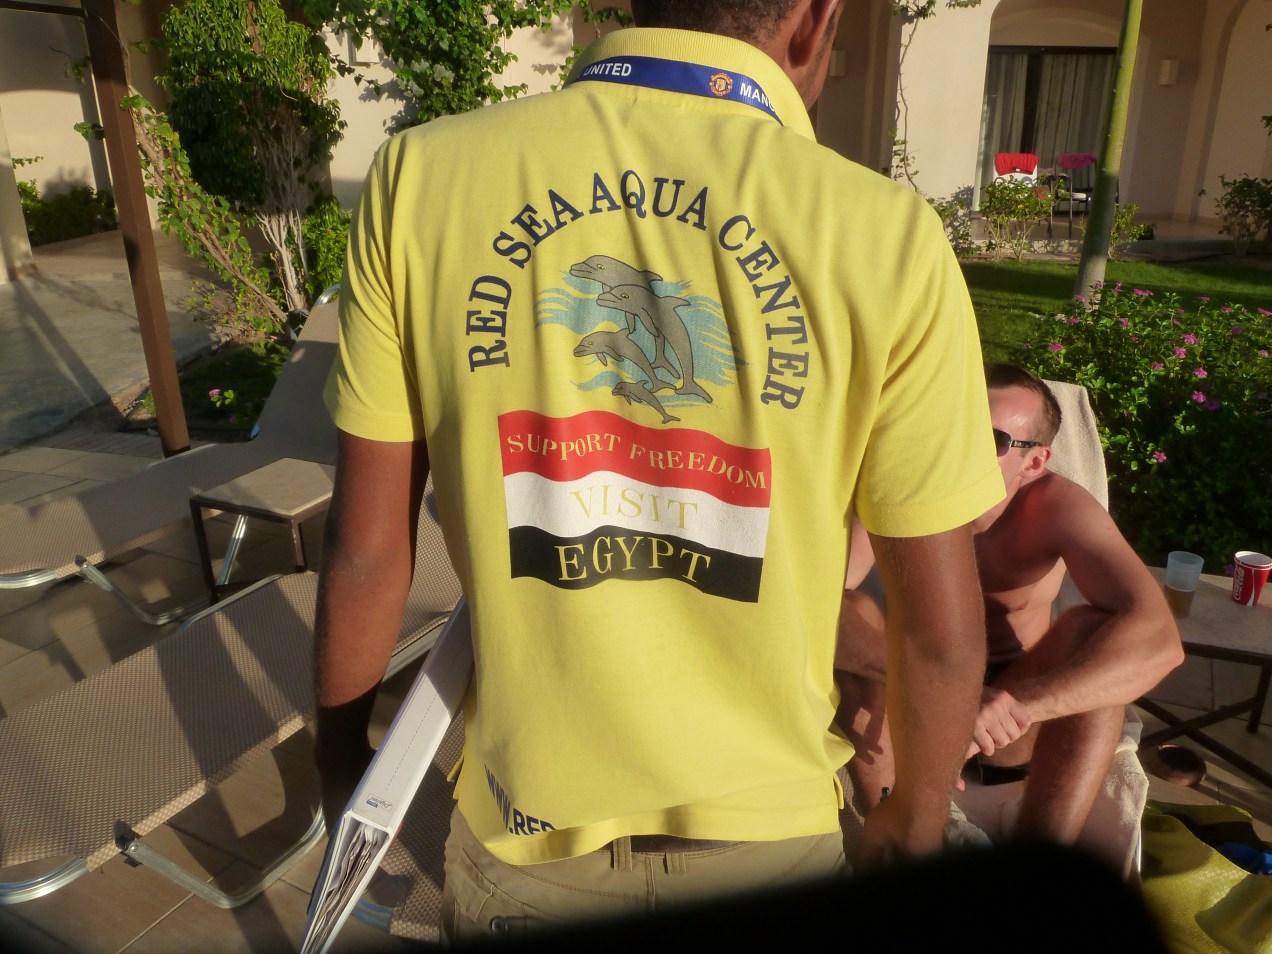 Support freedom visiy egypt